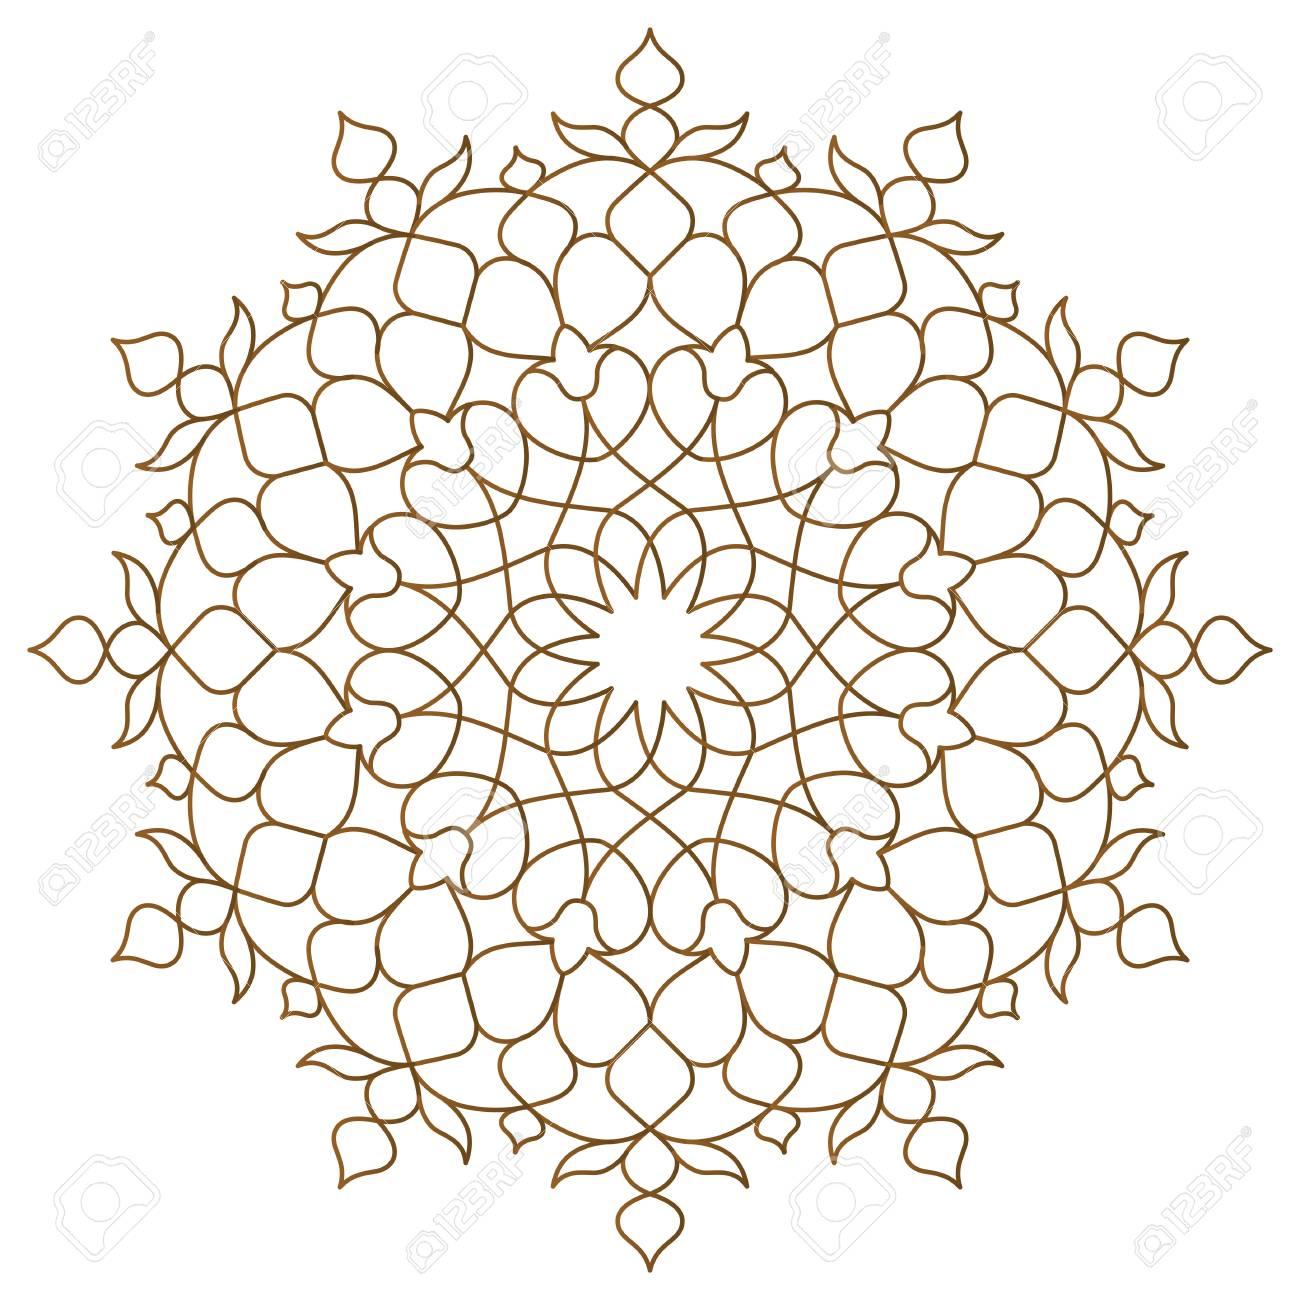 Arabic circle pattern monoline ornament - 101184673